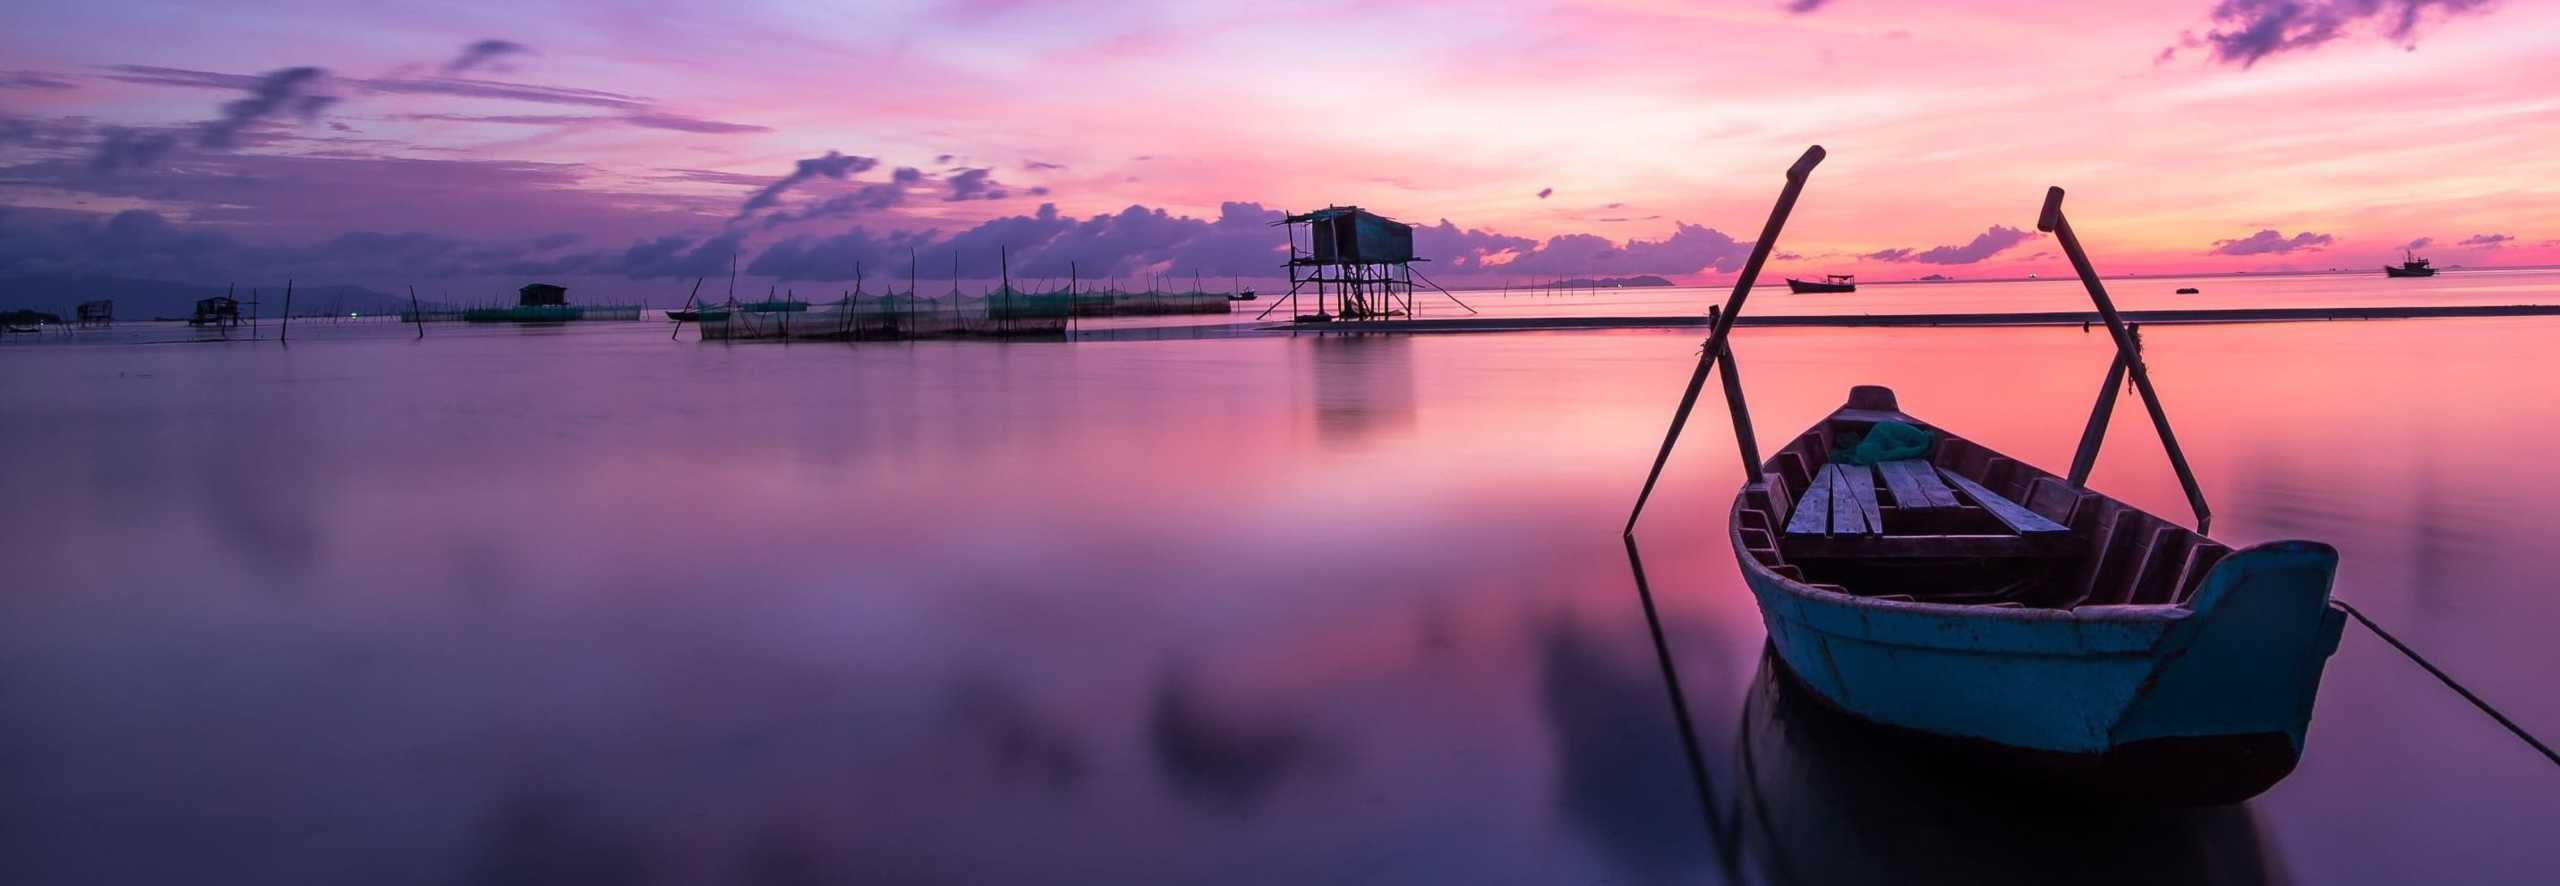 beach-boat-sunrise-scenery-seascape-2-min